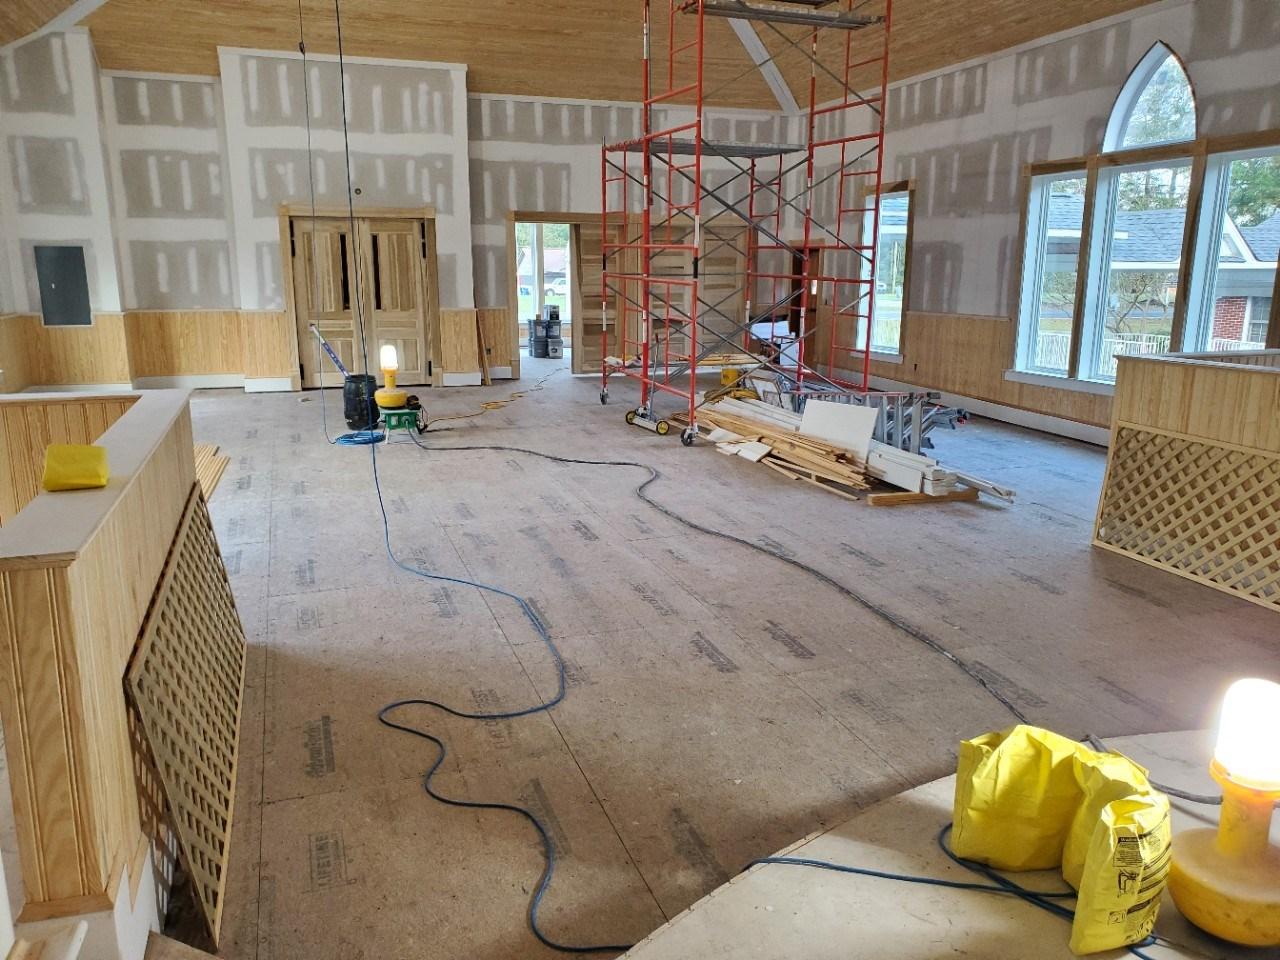 Church interior under construction